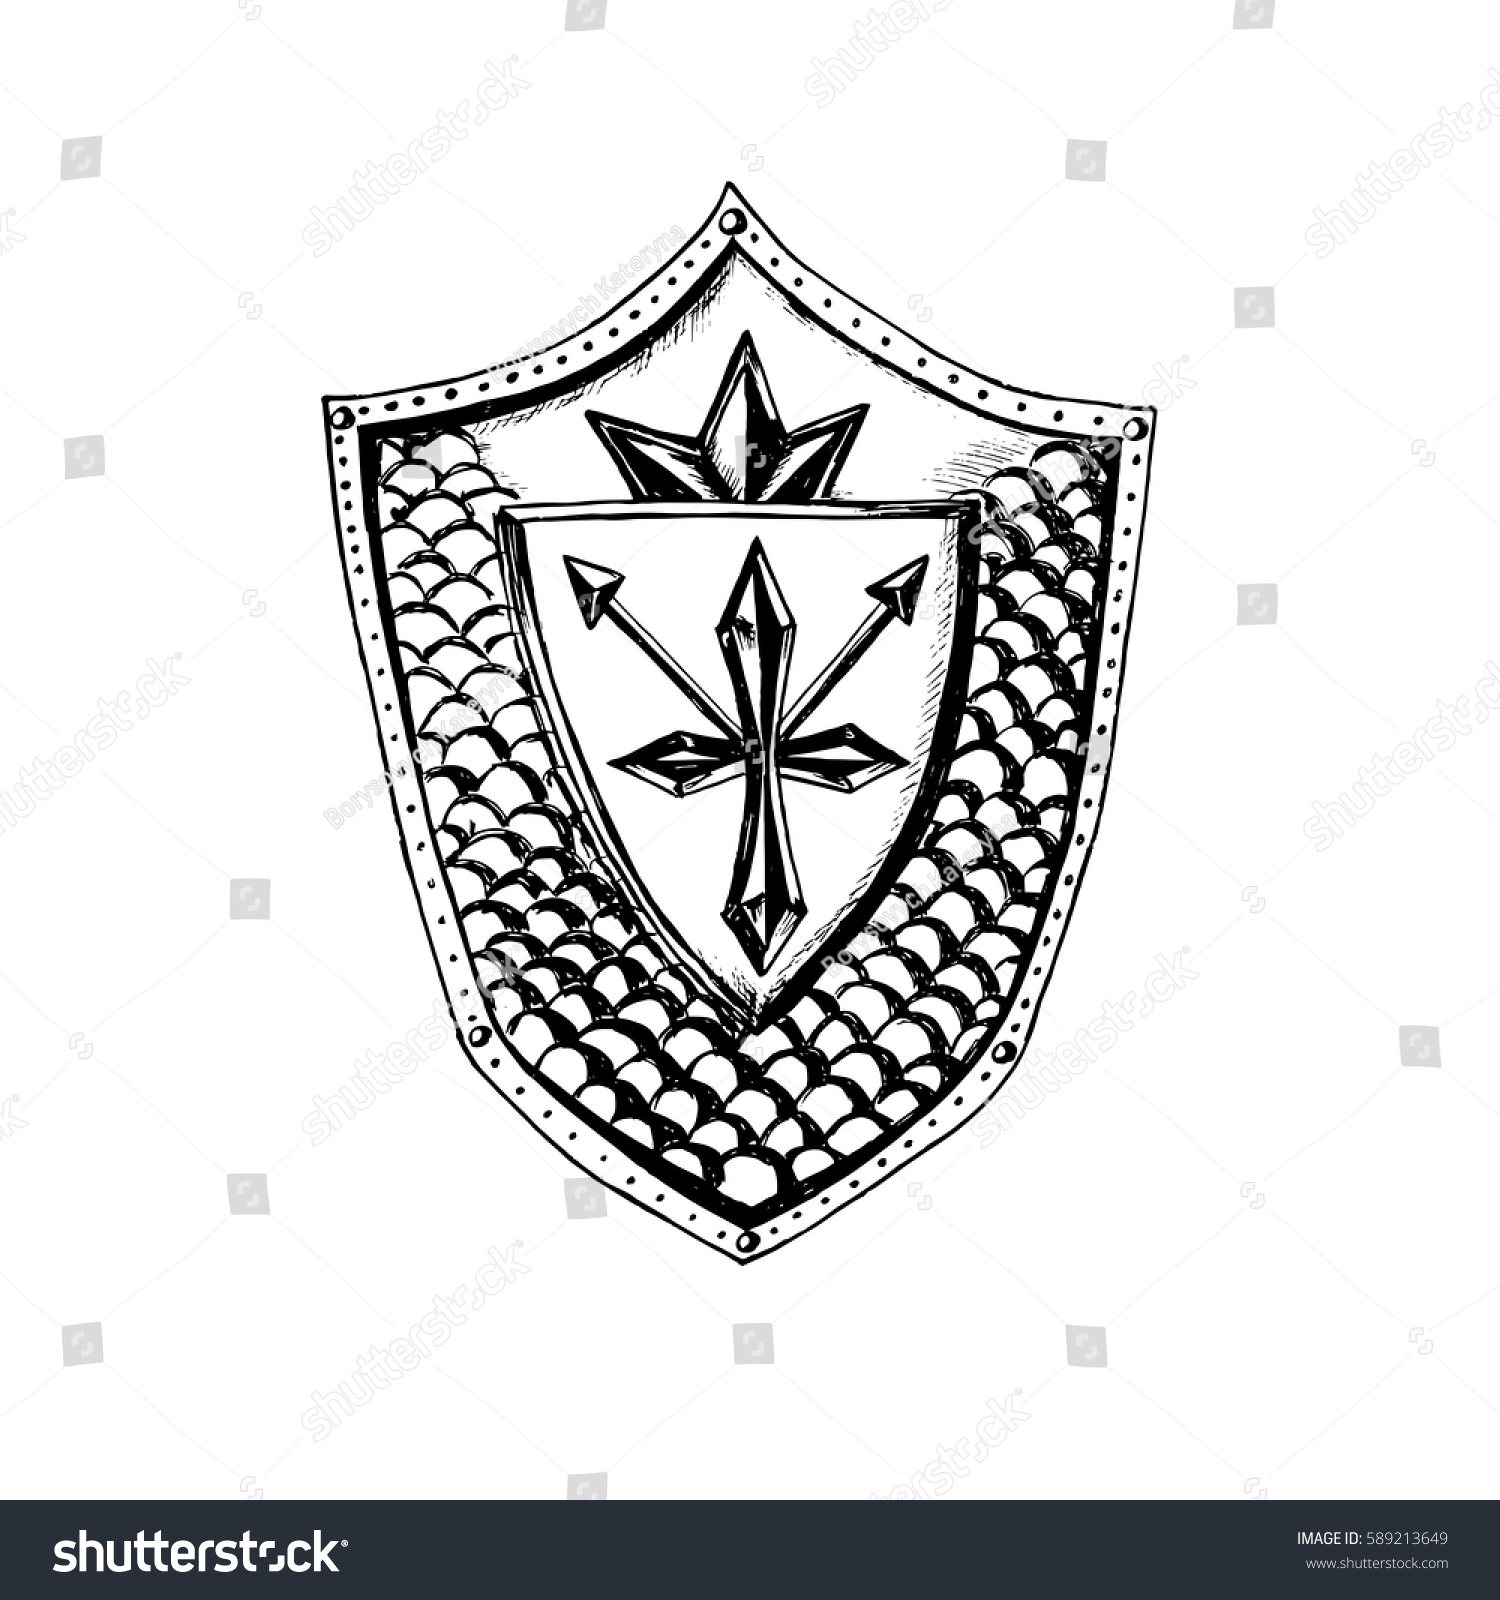 Antique shield cross arrow crownpencil drawingknight stock vector